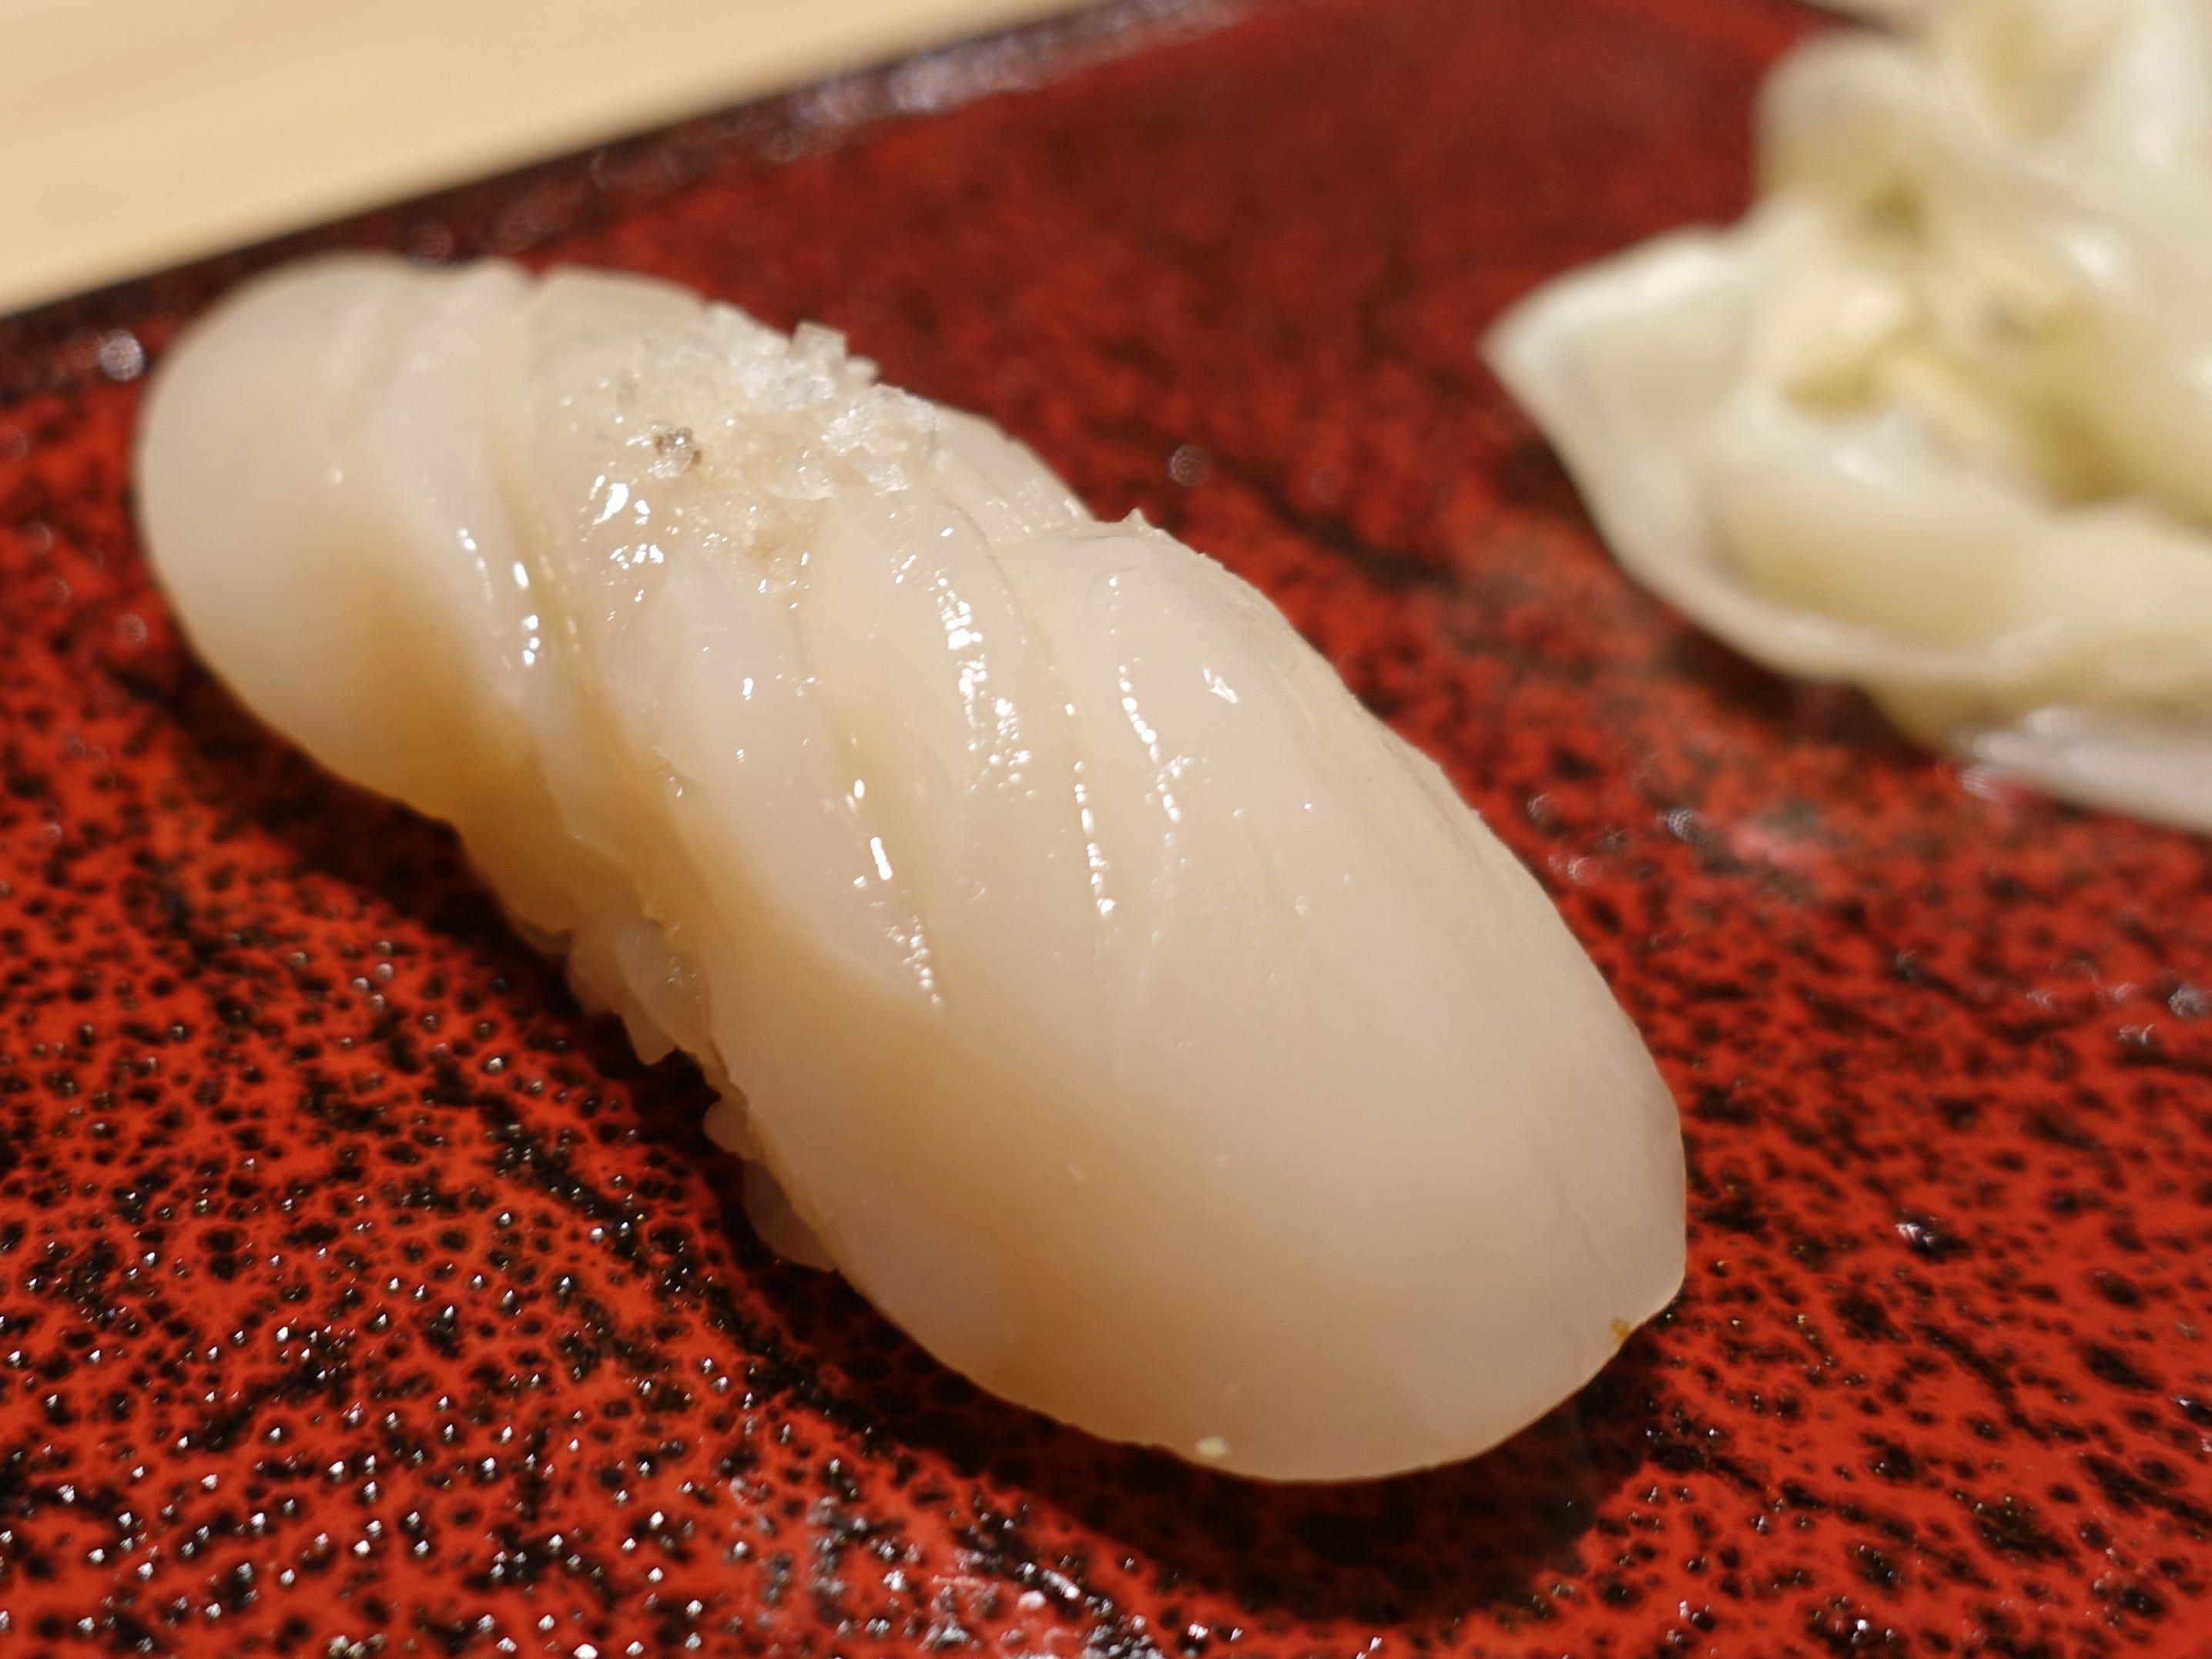 Konbu-cured scallop nigiri with yuzu and salt at ShinBay in Scottsdale.